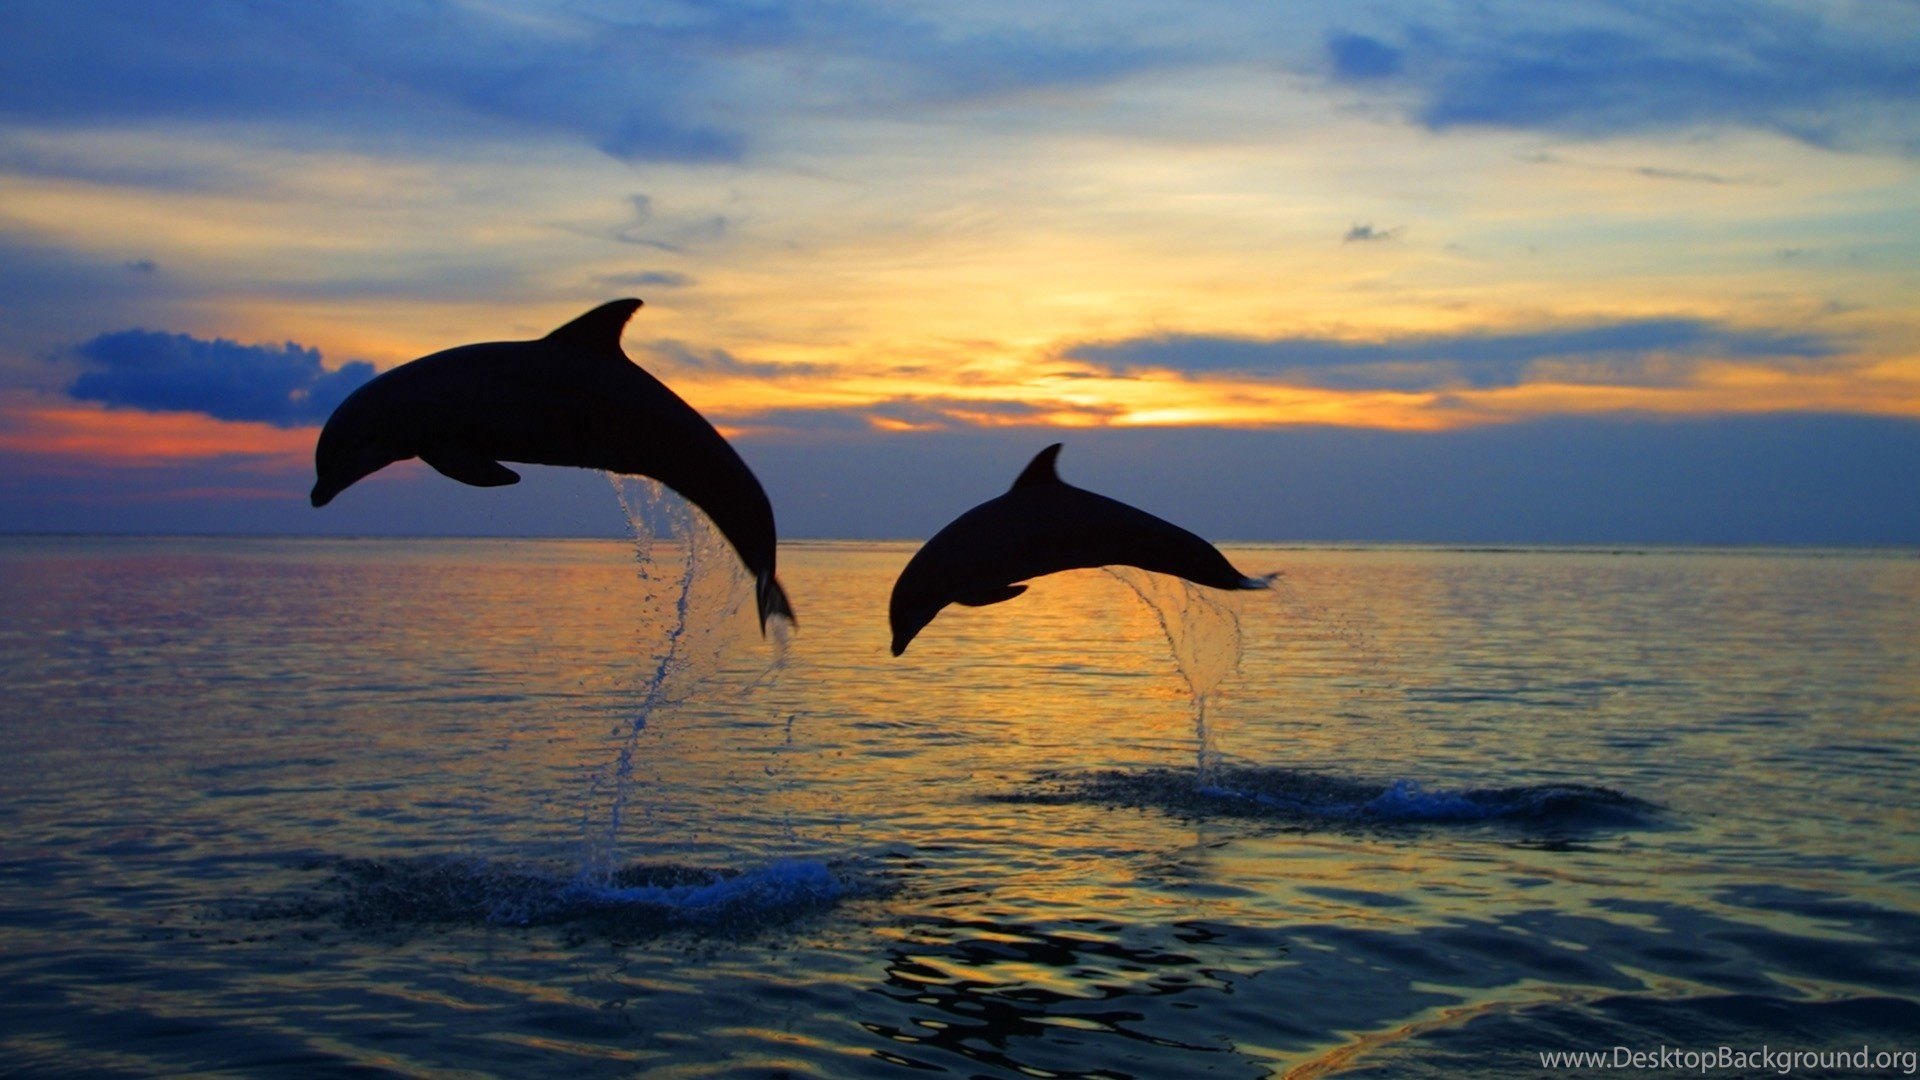 Download Sea Dolphins Wallpapers 2560x1600 Desktop Background